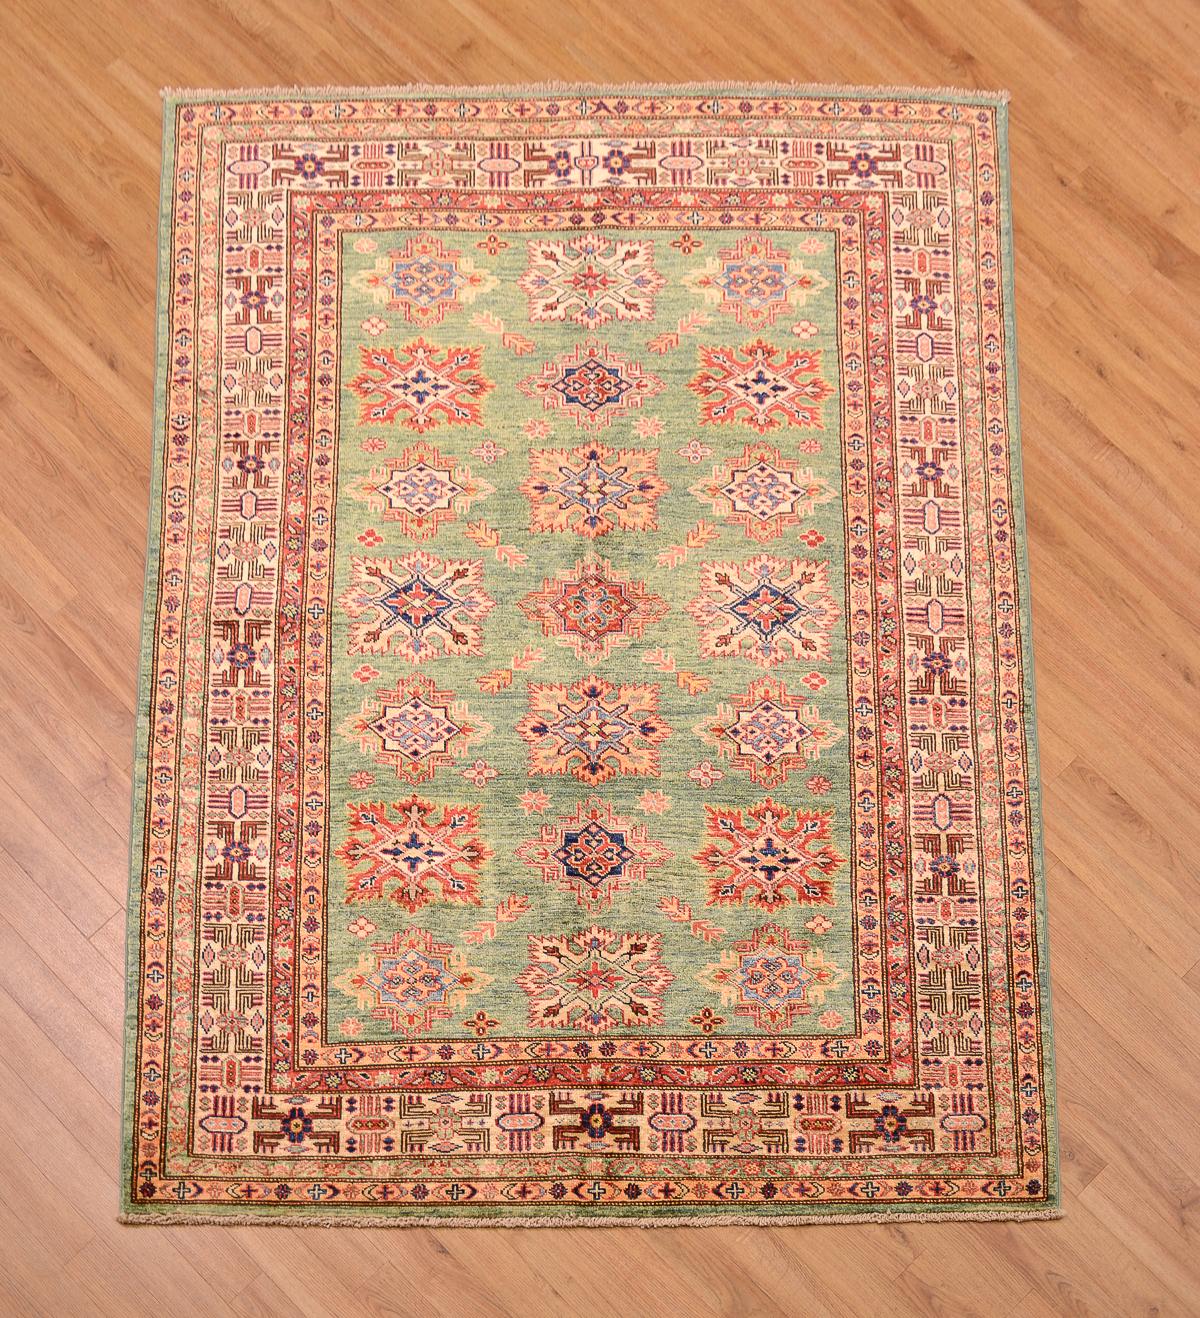 Fine Afghan Green Kazak Rug 1.97x1.46m